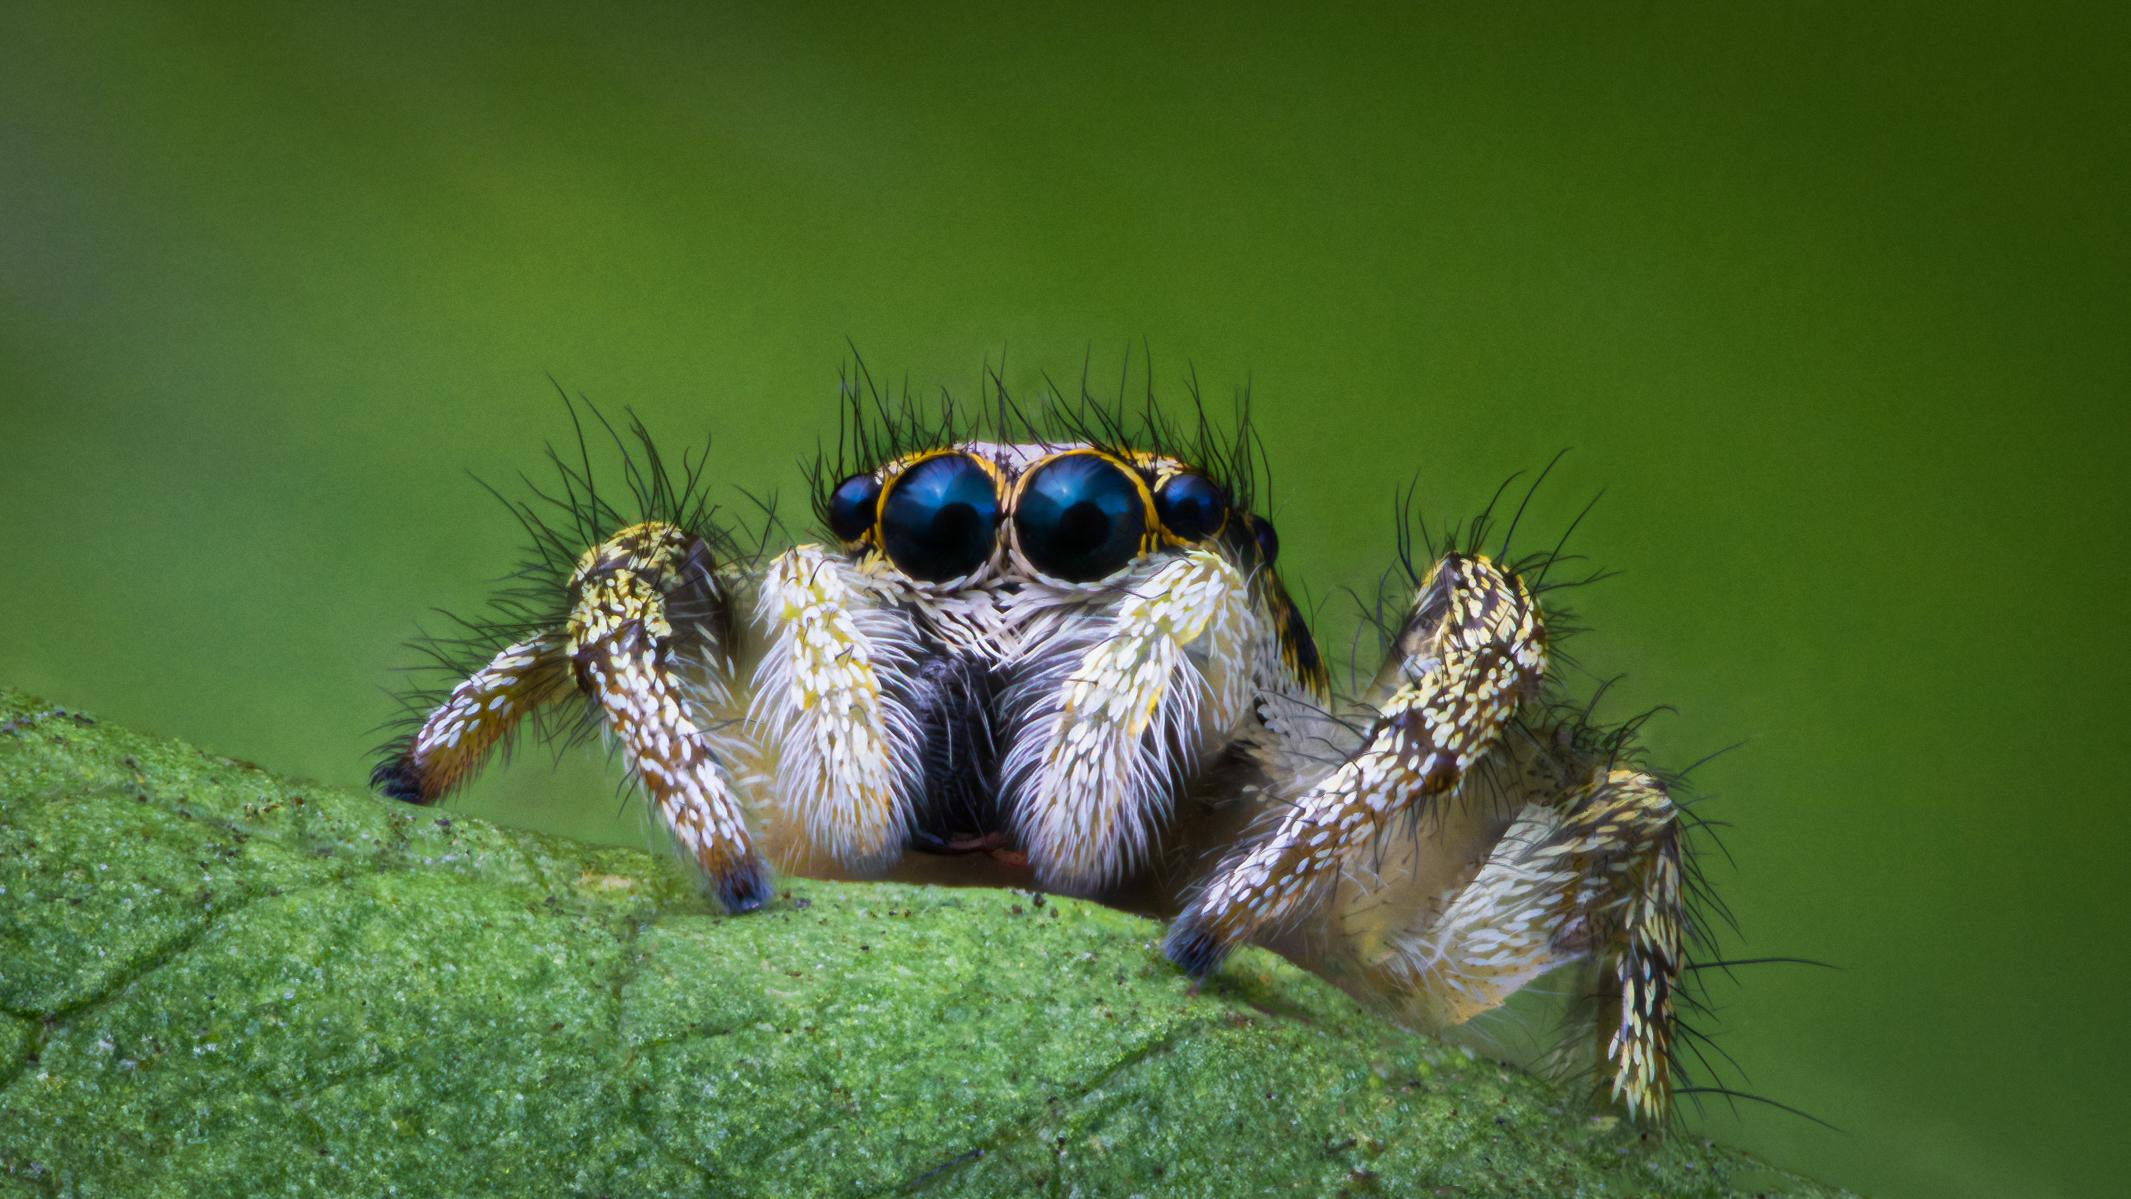 Zebra Spider on Green Leaf (Salticidae Salticus)-Final.jpg